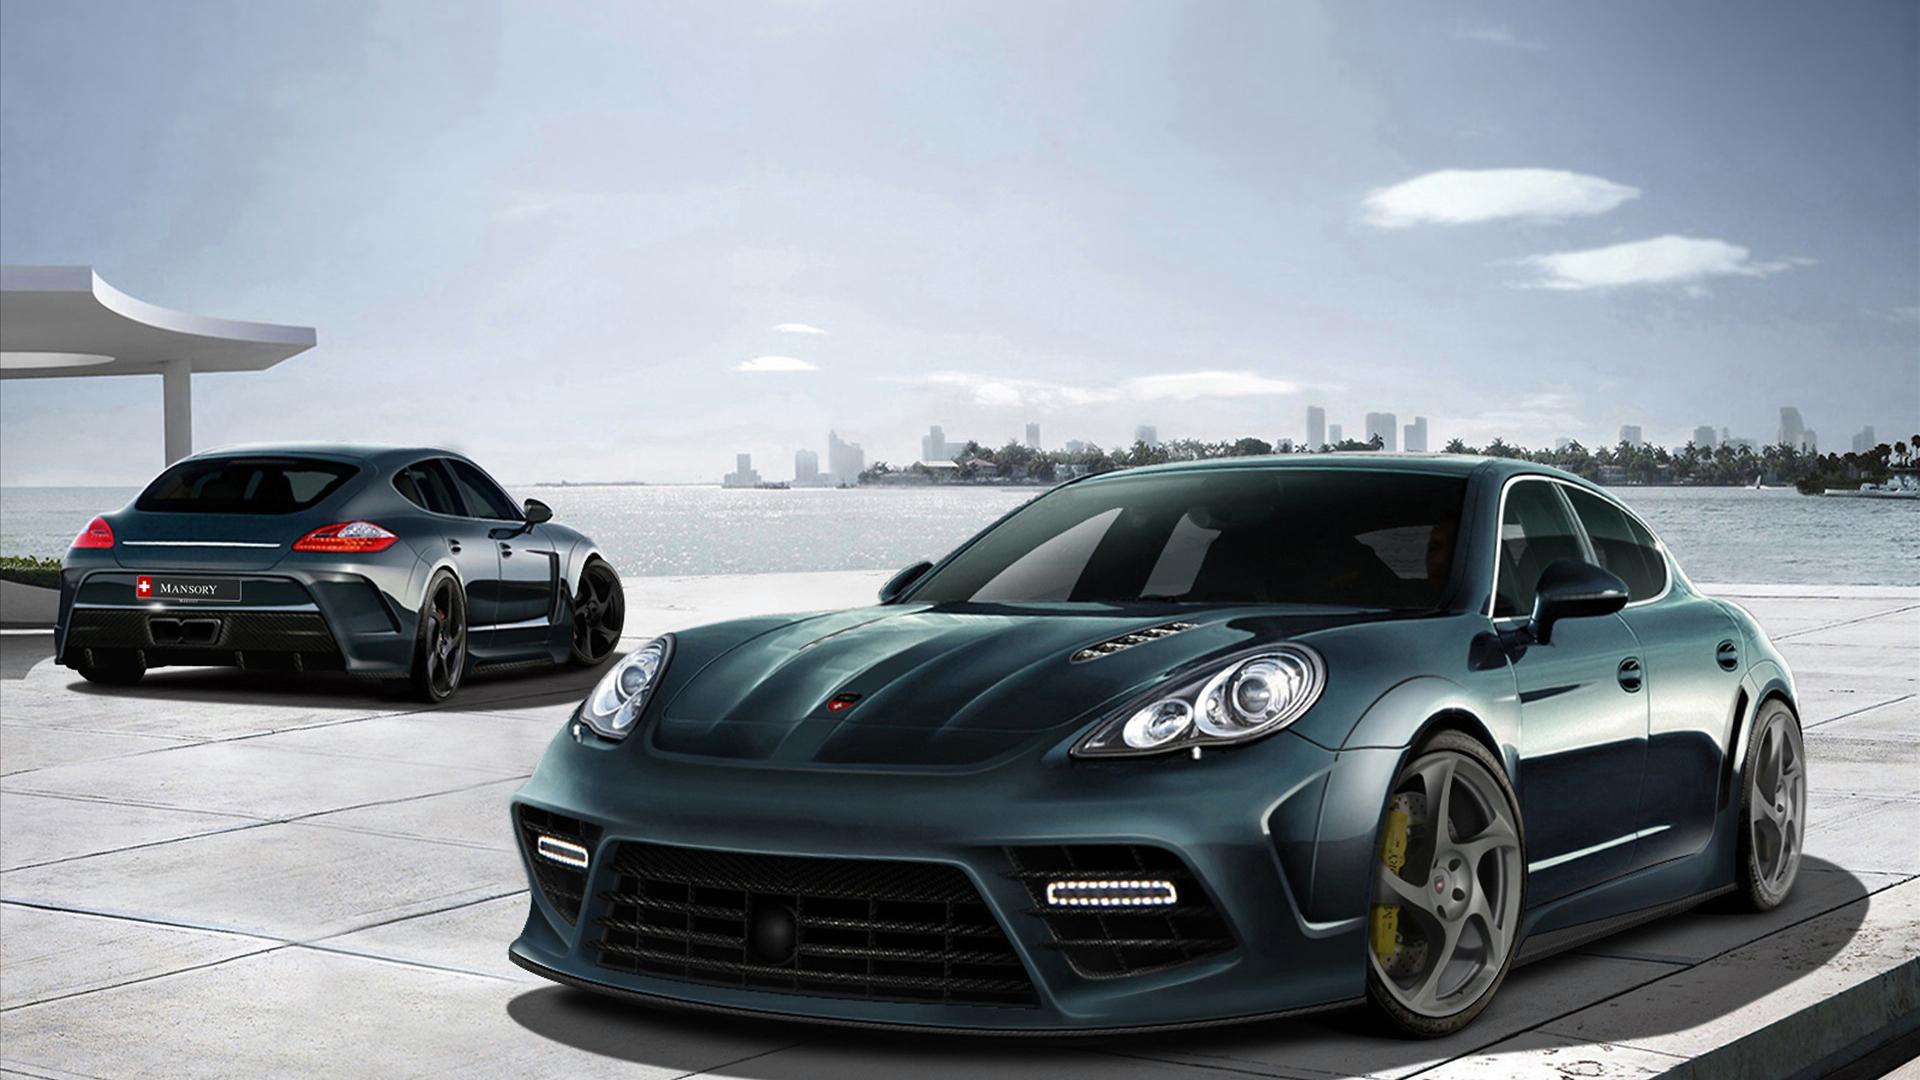 Porsche Panamera Black Sports Car Full HD Desktop Wallpapers 1080p 1920x1080